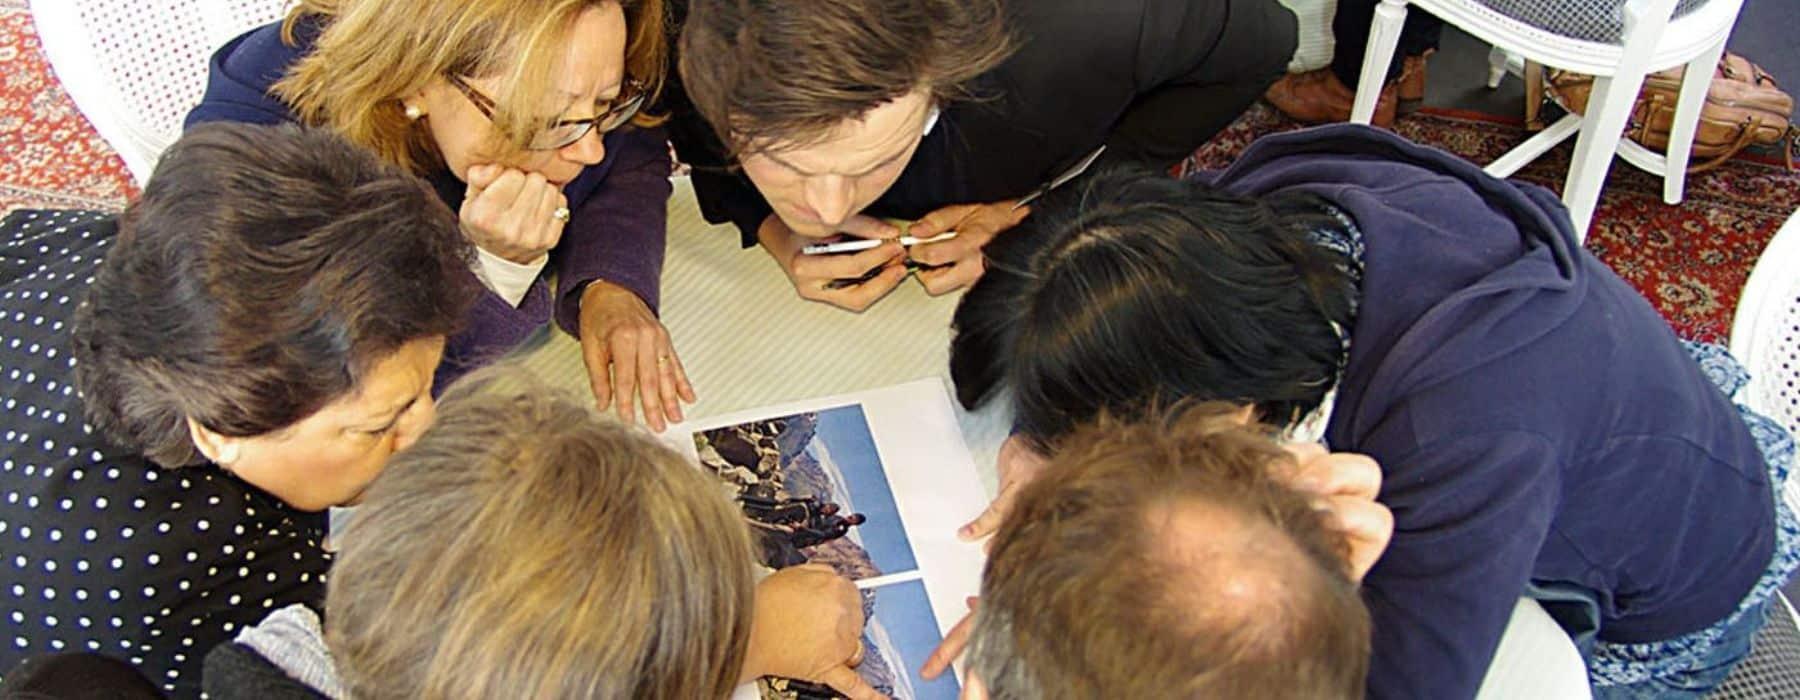 team building rallye des 5 sens (1)